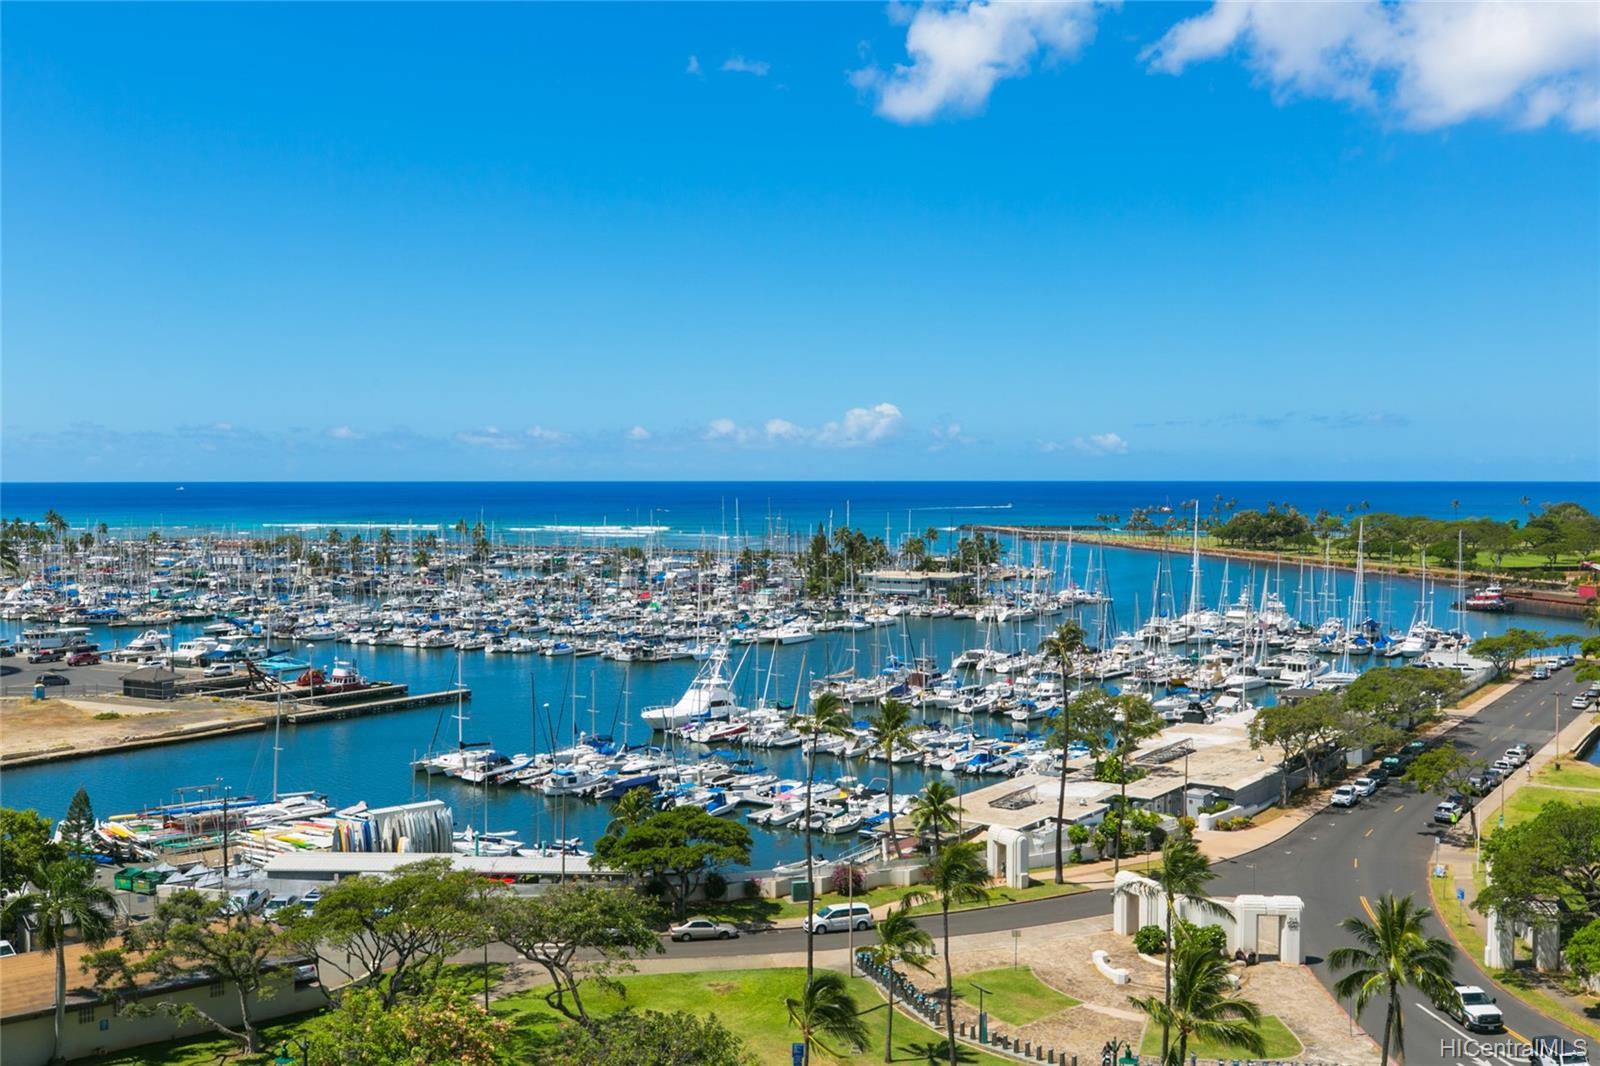 1600 Ala Moana Blvd Honolulu - Rental - photo 1 of 25